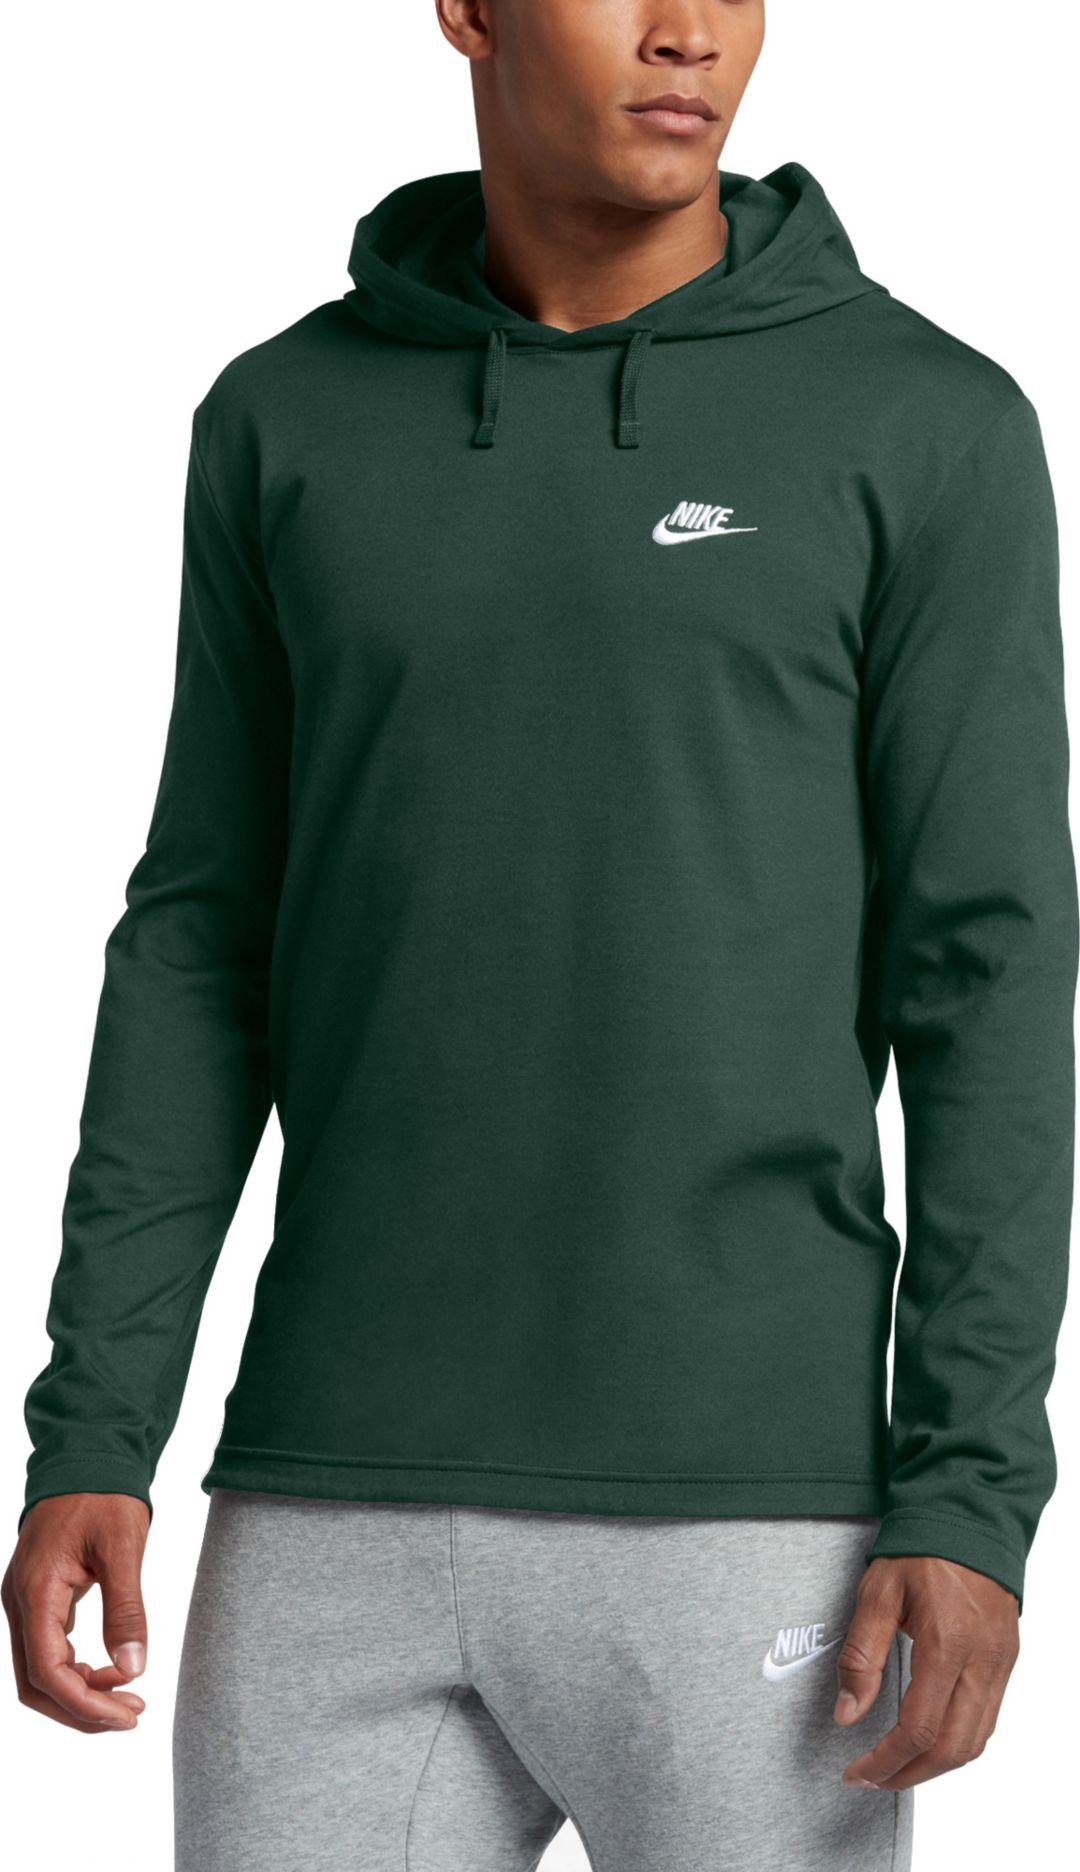 46f1f2c63 Nike Men's Jersey Lightweight Pullover Hoodie | DICK'S Sporting Goods